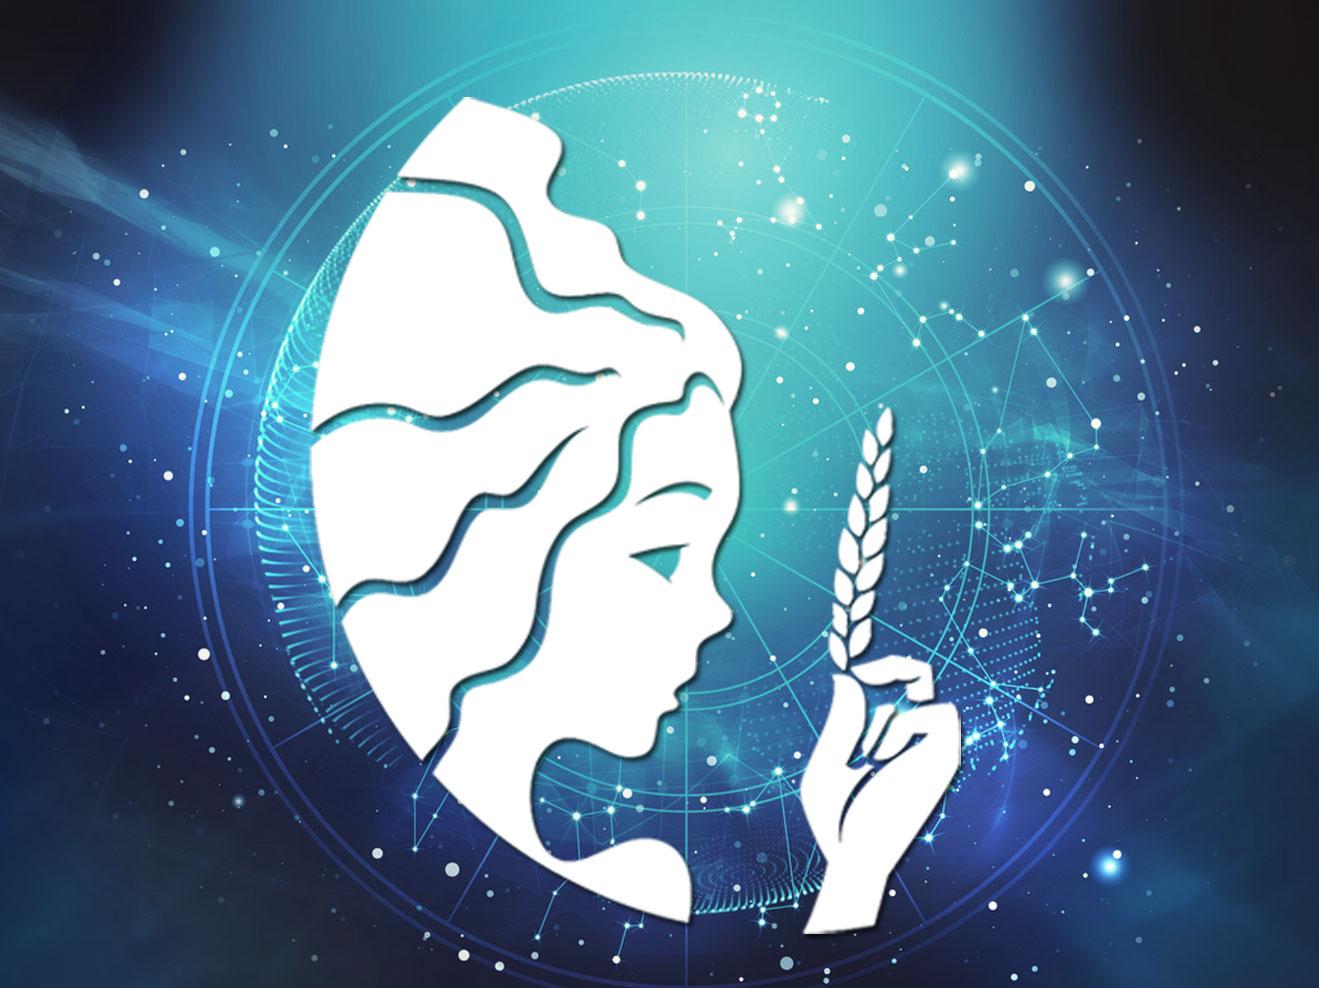 Jungfrau Horoskop